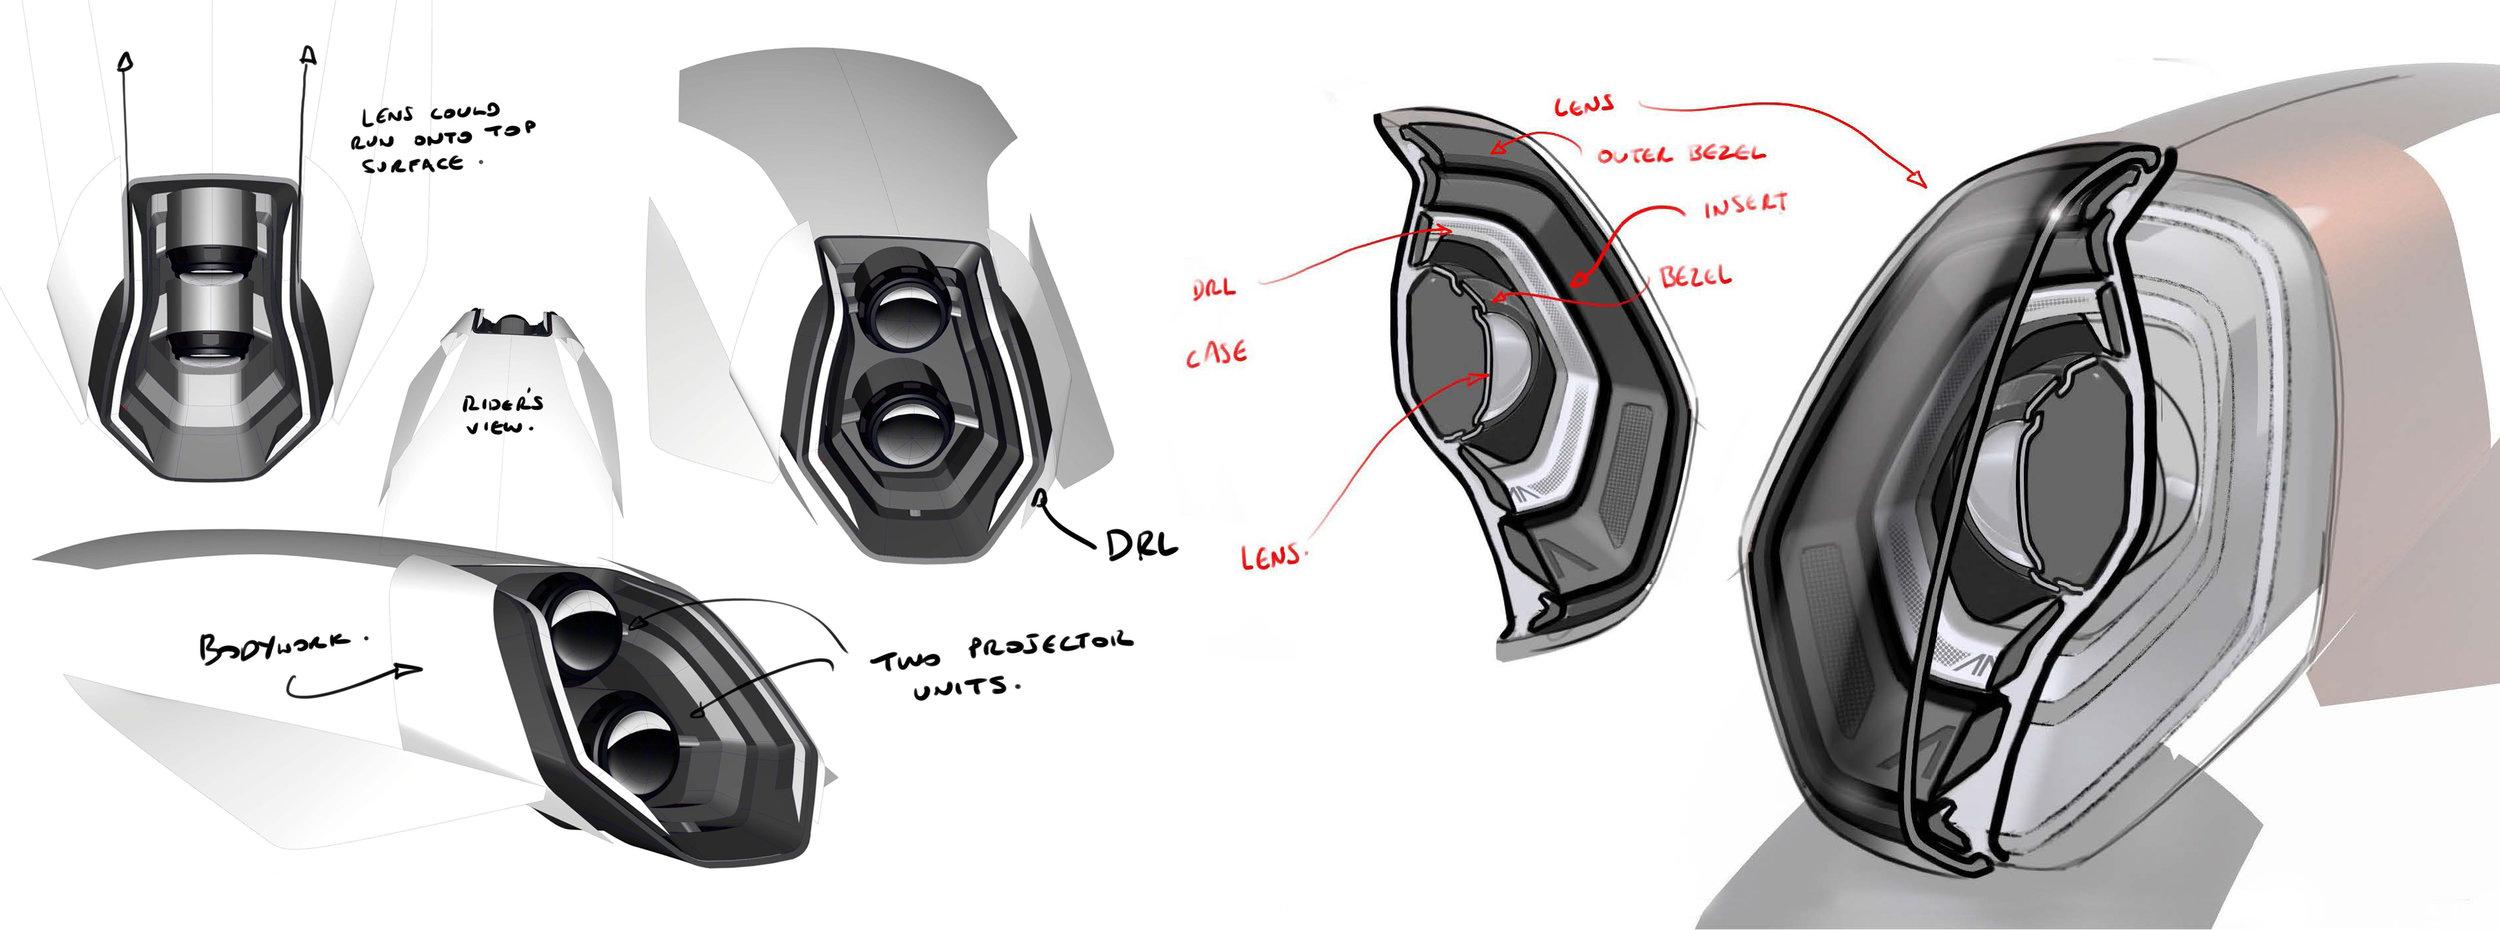 Headlight concepts.